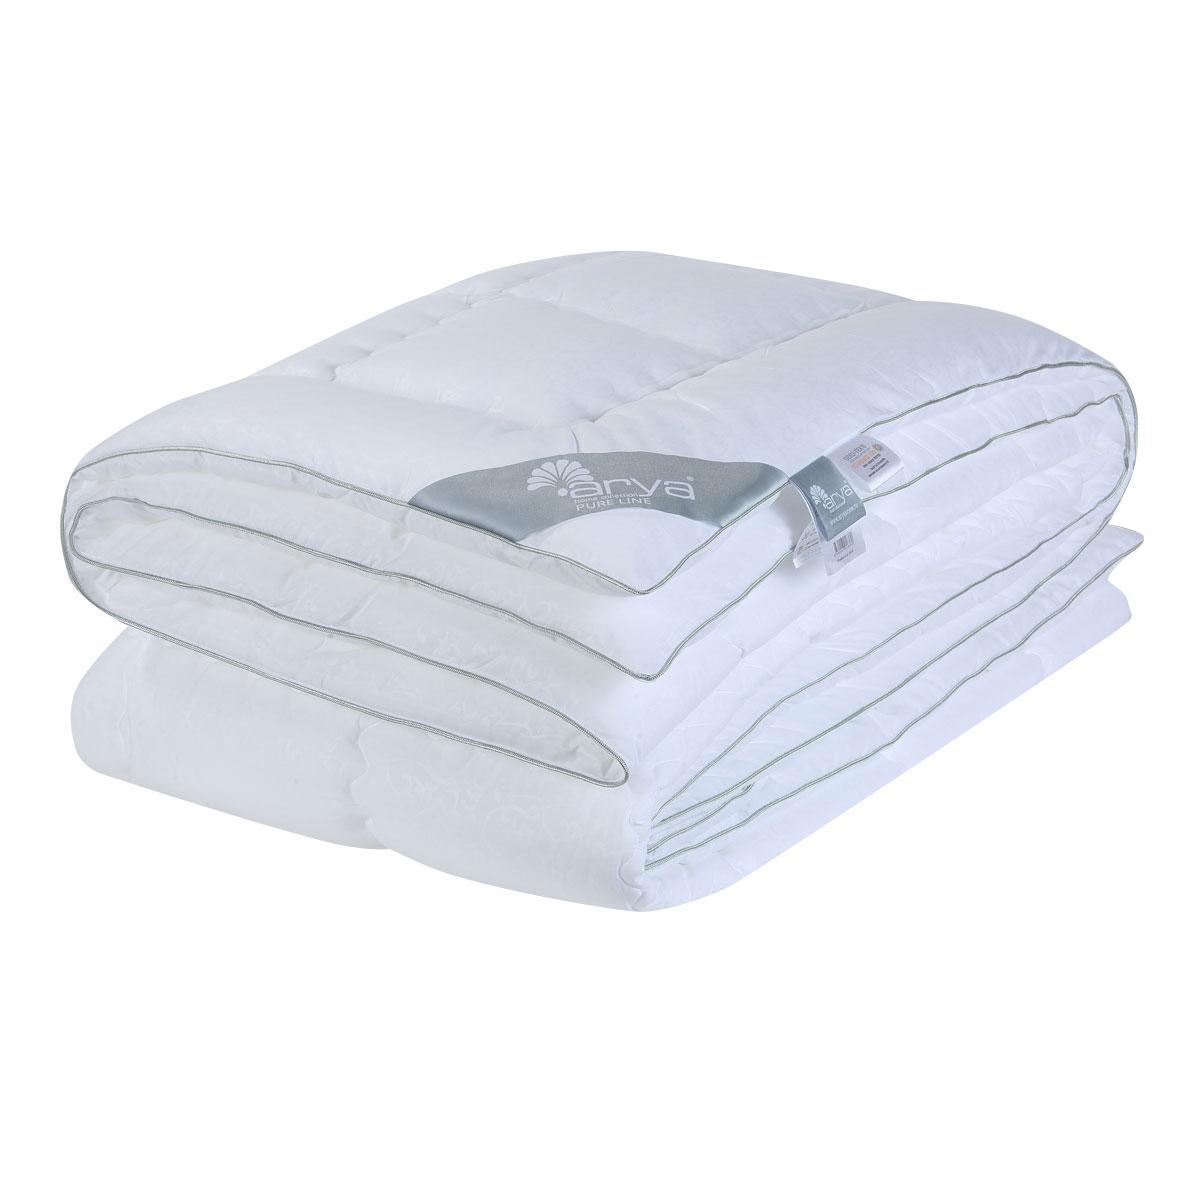 Одеяло Arya home collection Comfort 215х155 см силиконизированное волокно